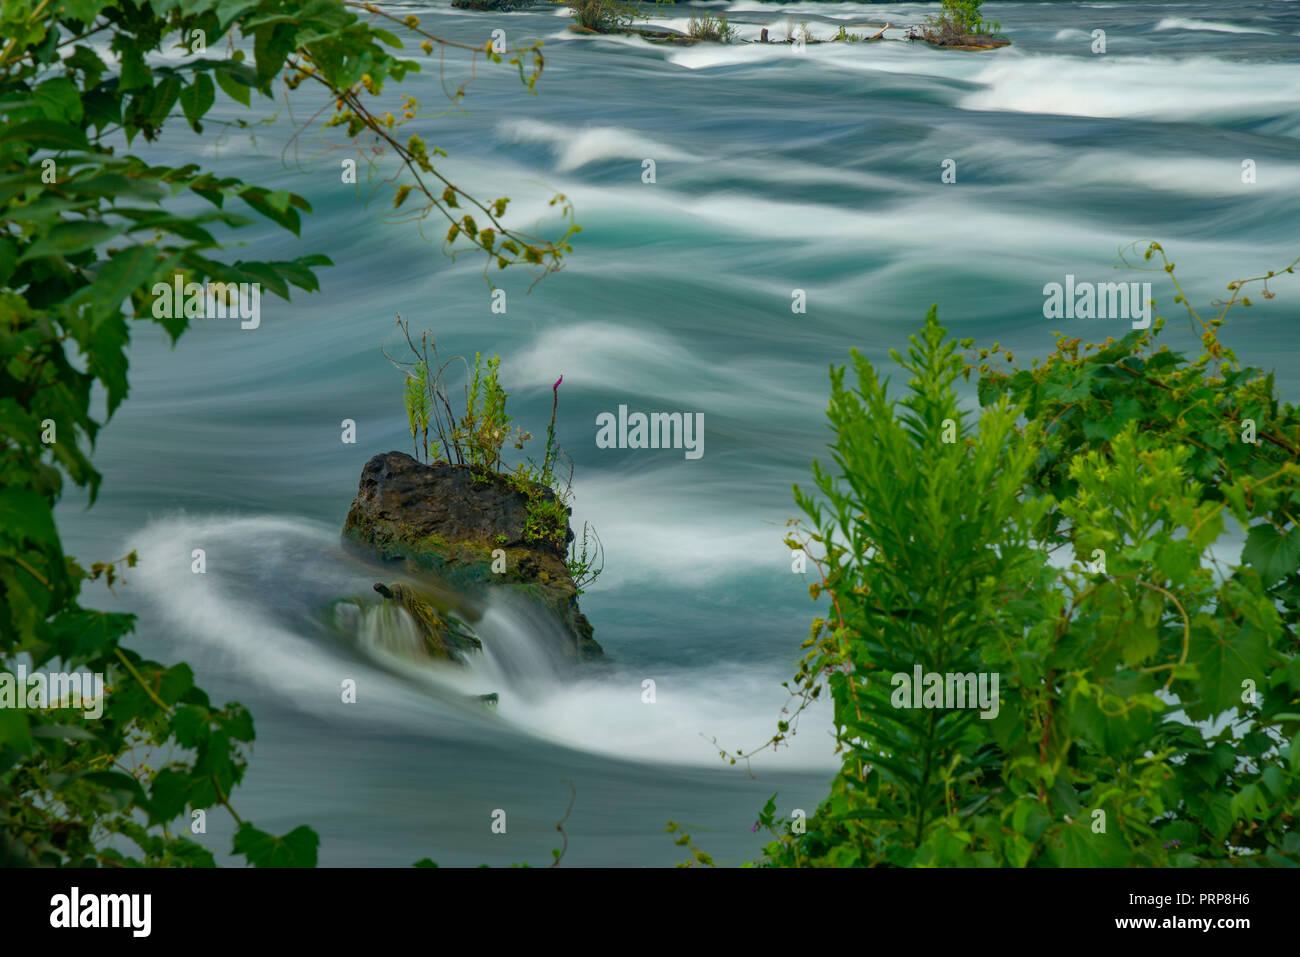 Fließende verschwommen Wasser, Niagara River, New York, USA Stockbild